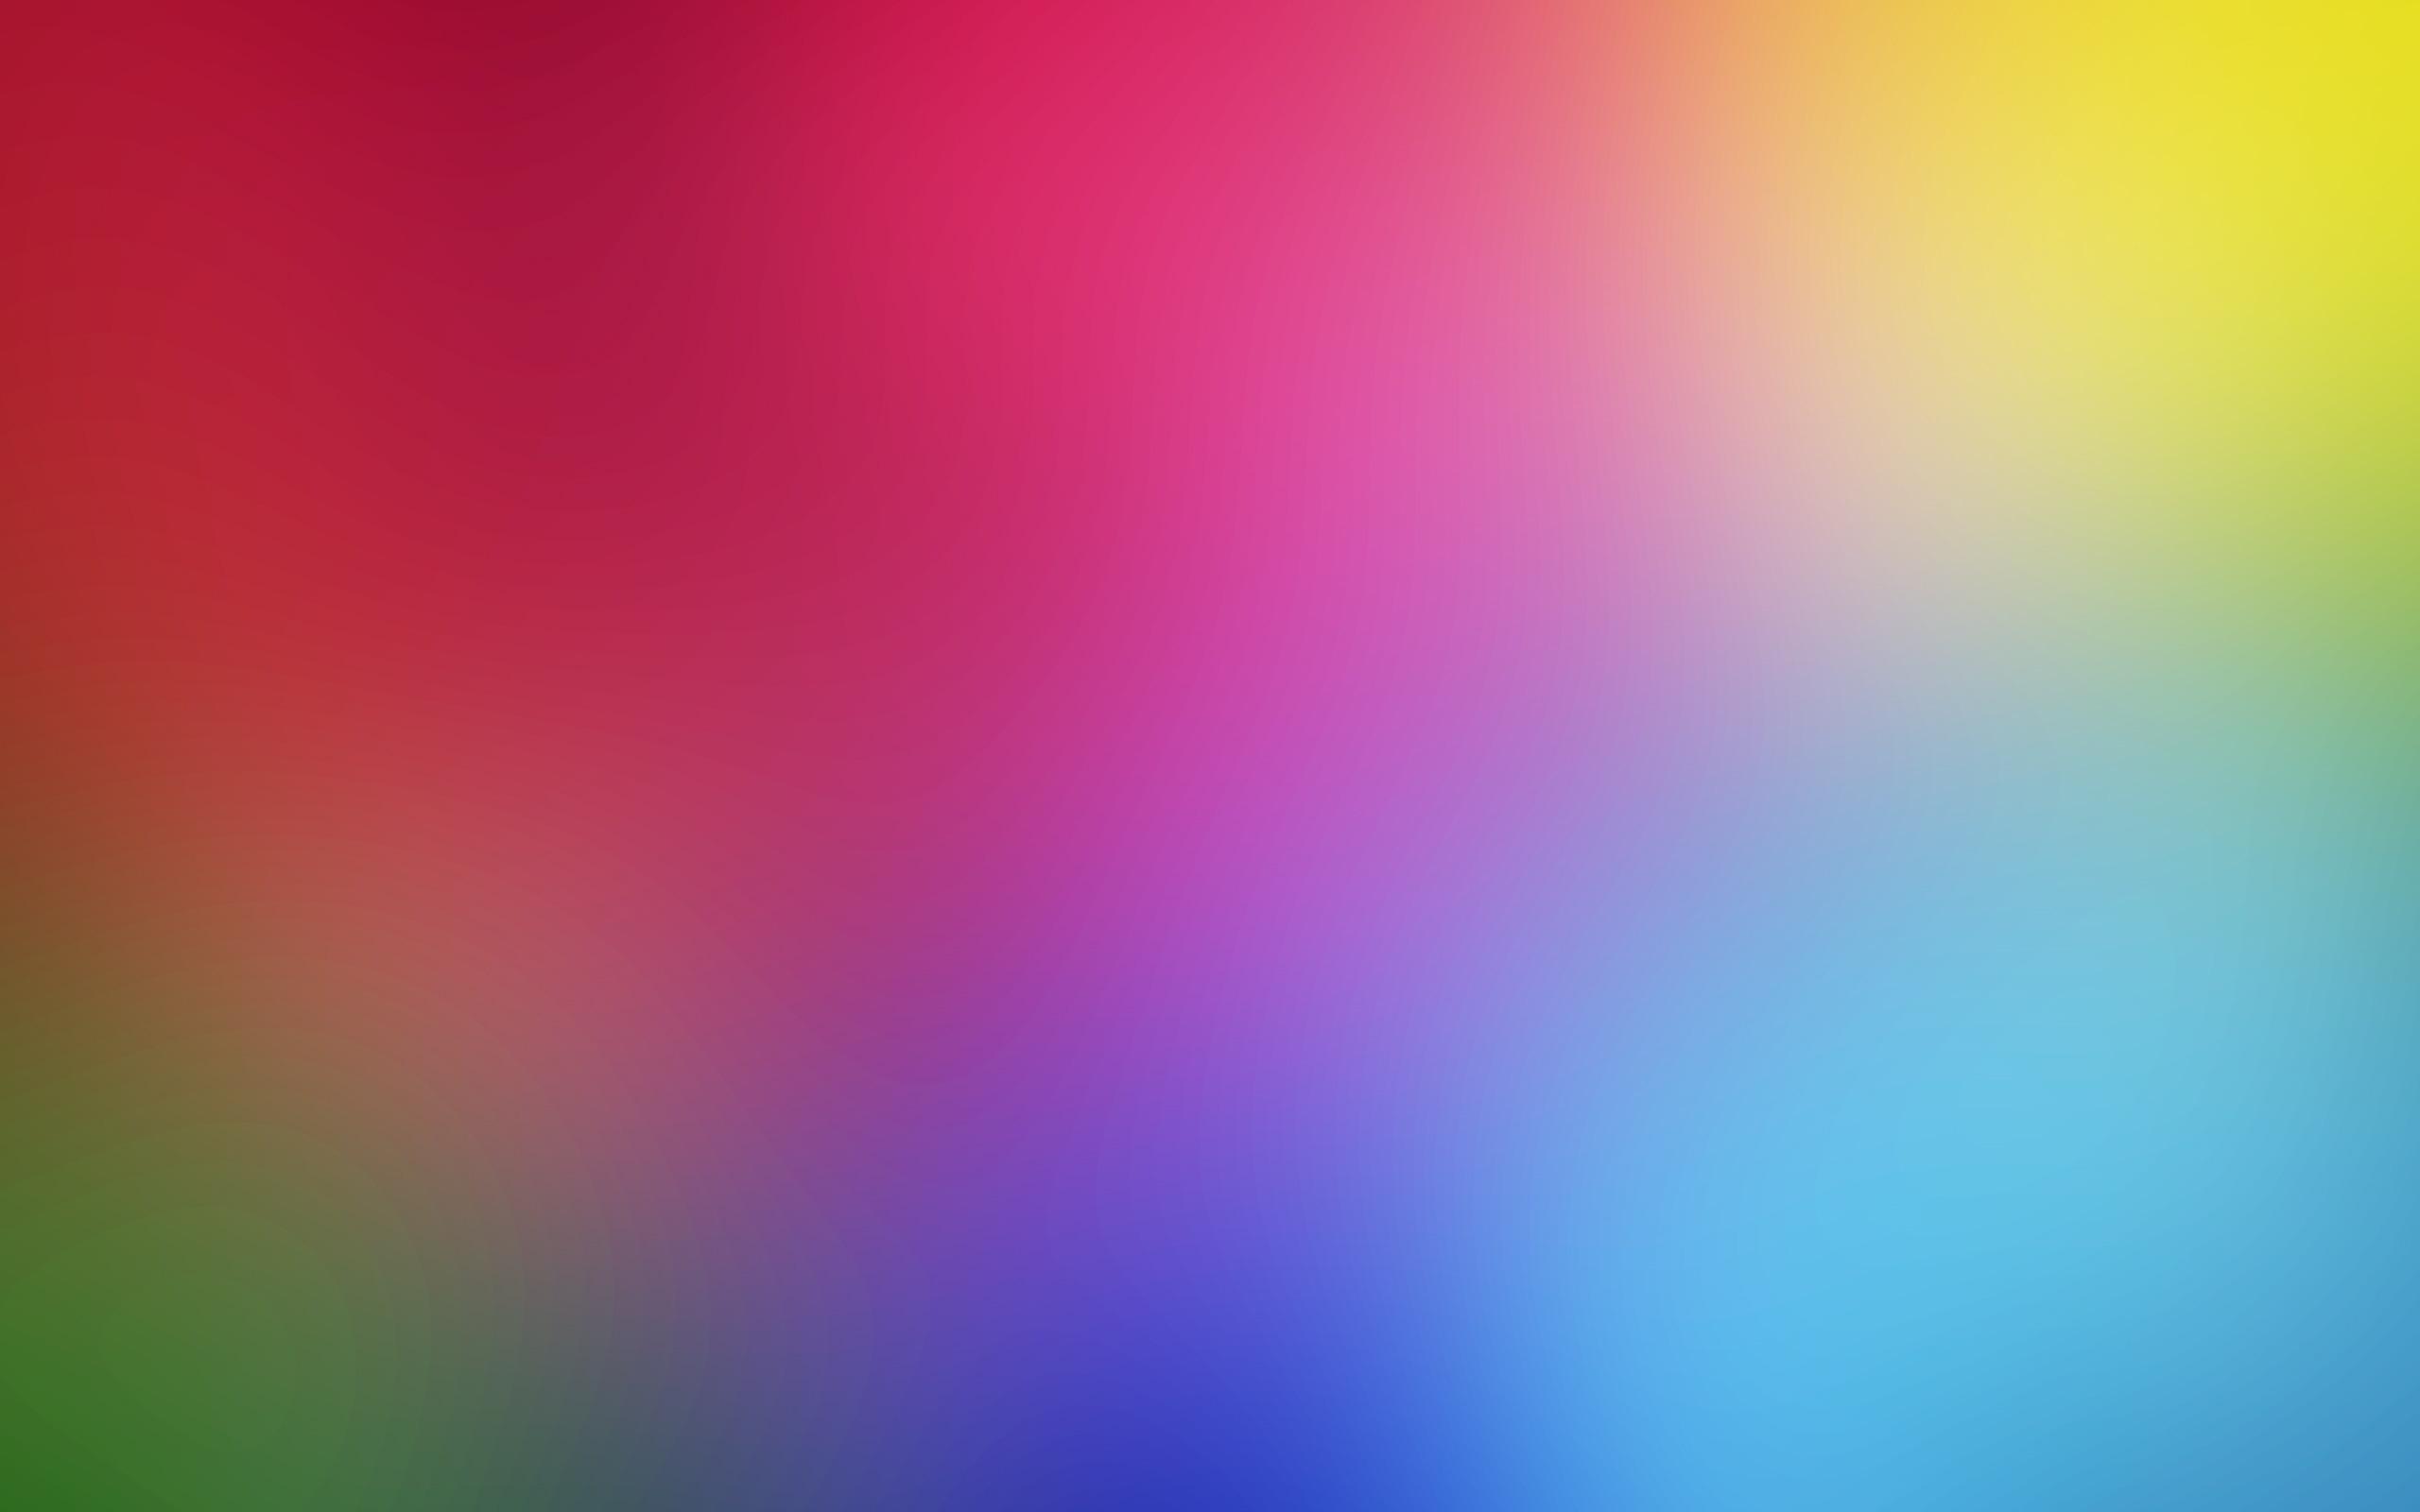 Underwater Iphone Wallpaper Colors Background Wallpaper 2560x1600 74008